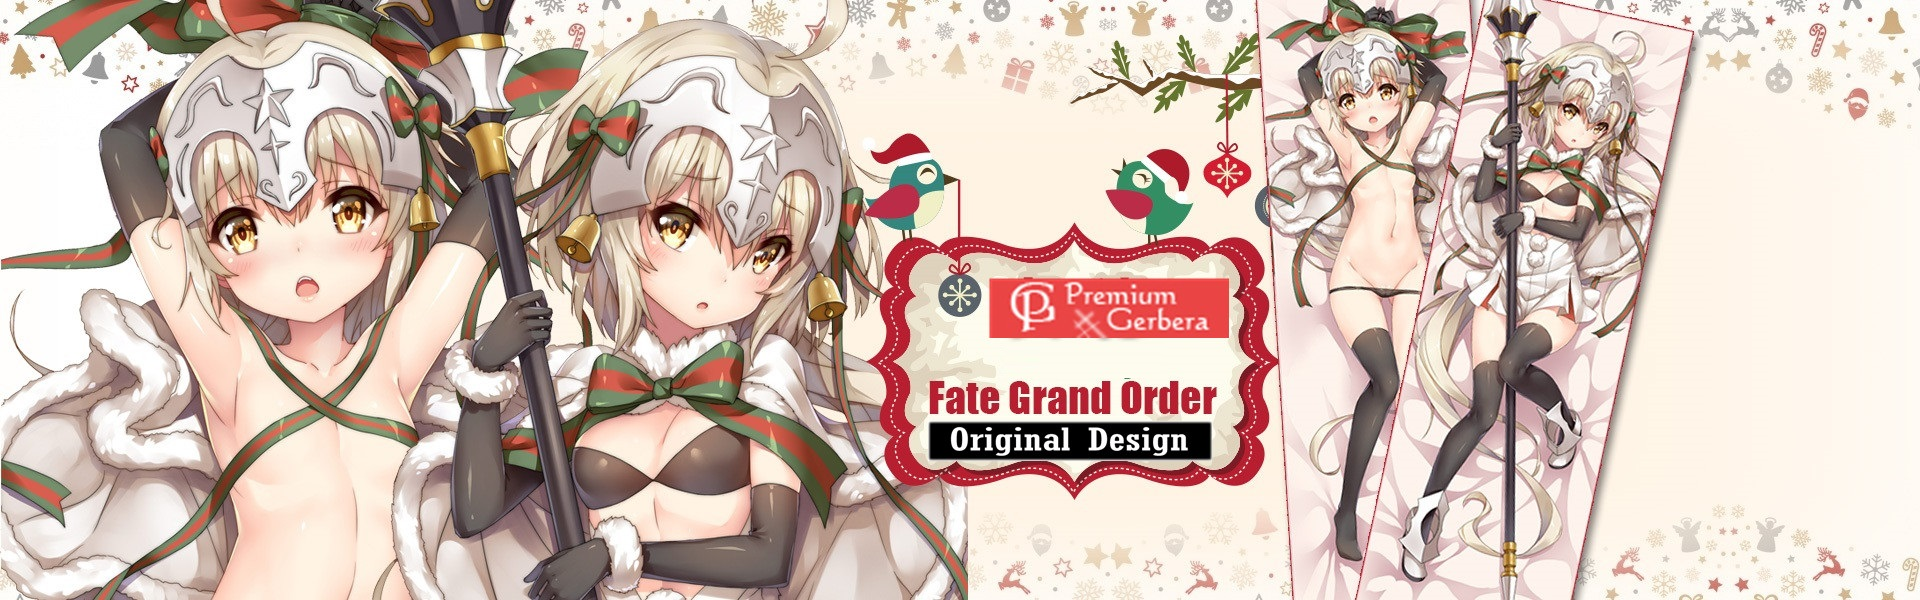 Fate/Grand Order ジャンヌ・ダルク・オルタ・サンタ・リリィ